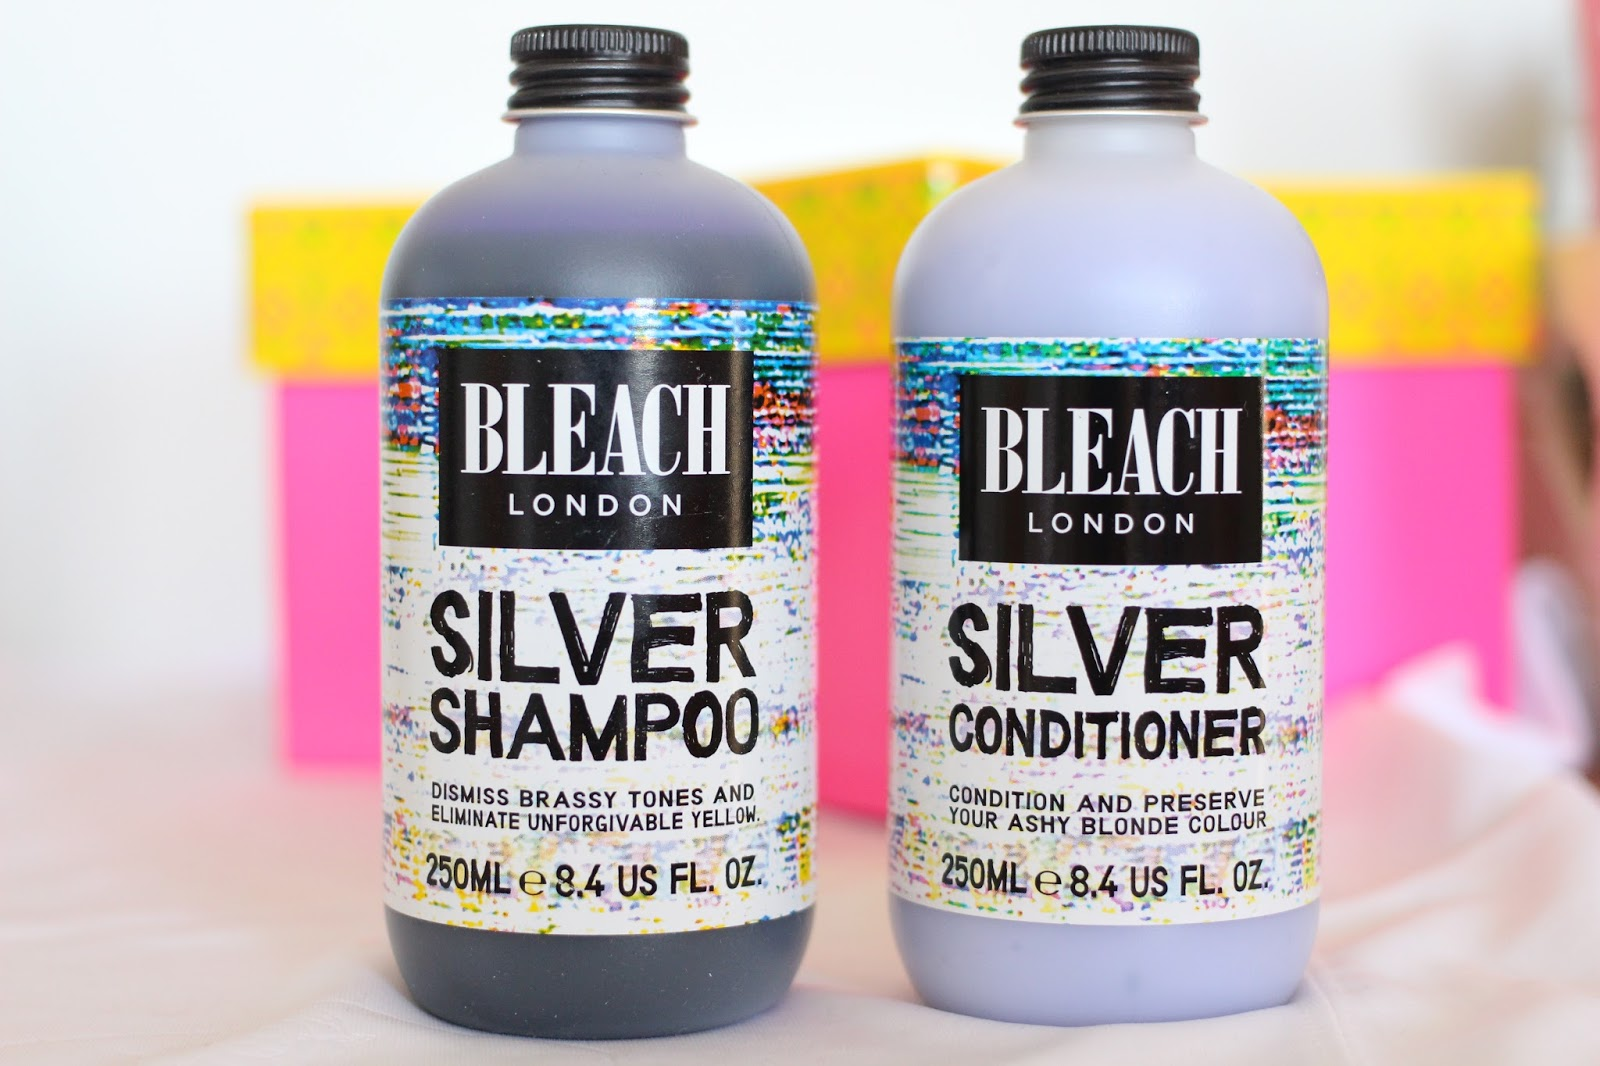 Bleach London Silver Shampoo & Silver Conditoner